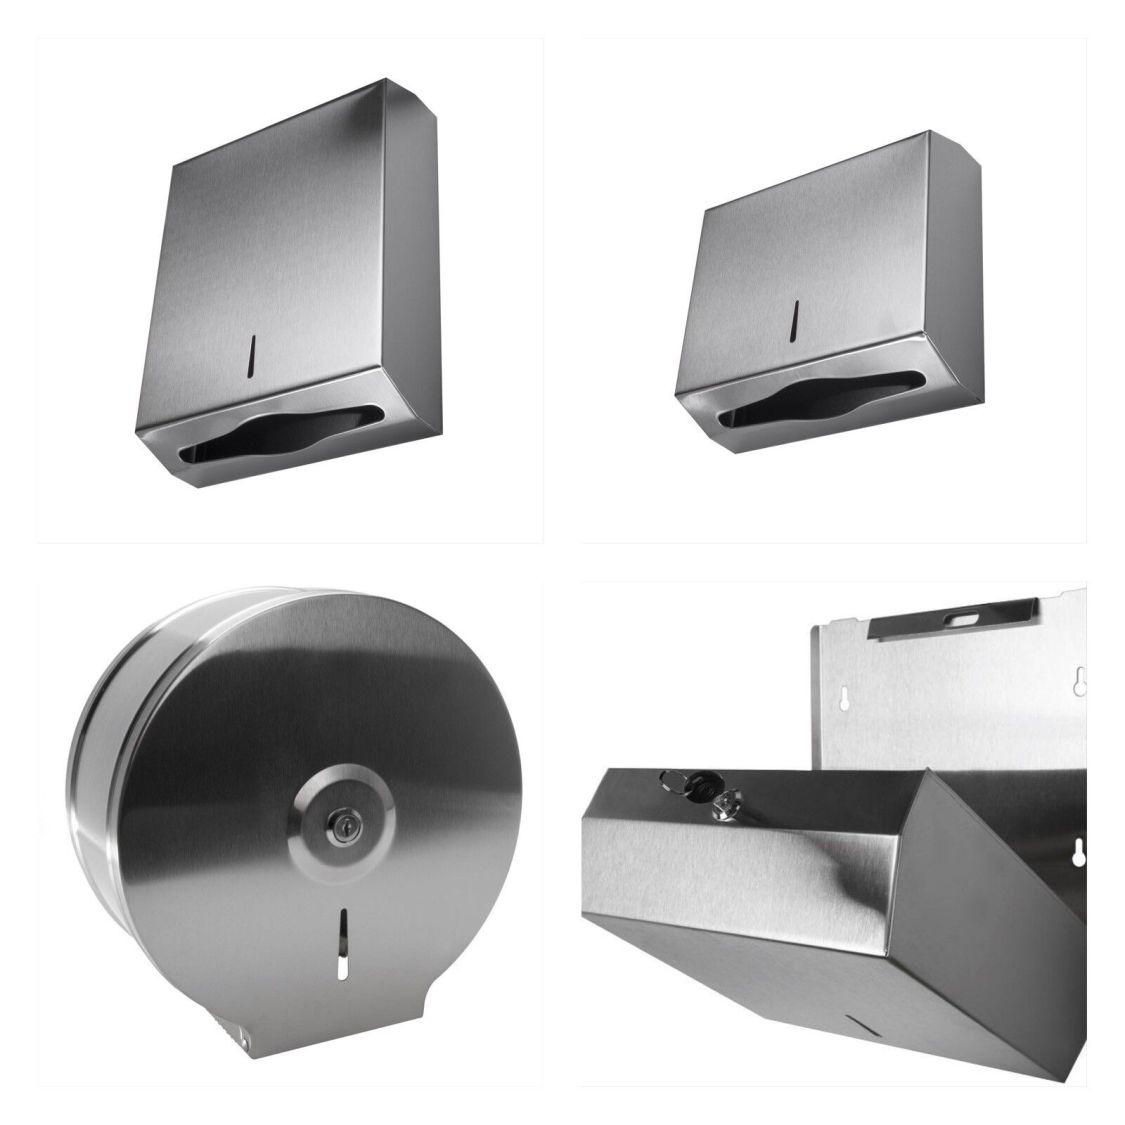 Edelstahl Handtuchspender PapierspenderToilettenpapier Papierhandtuchspender WC